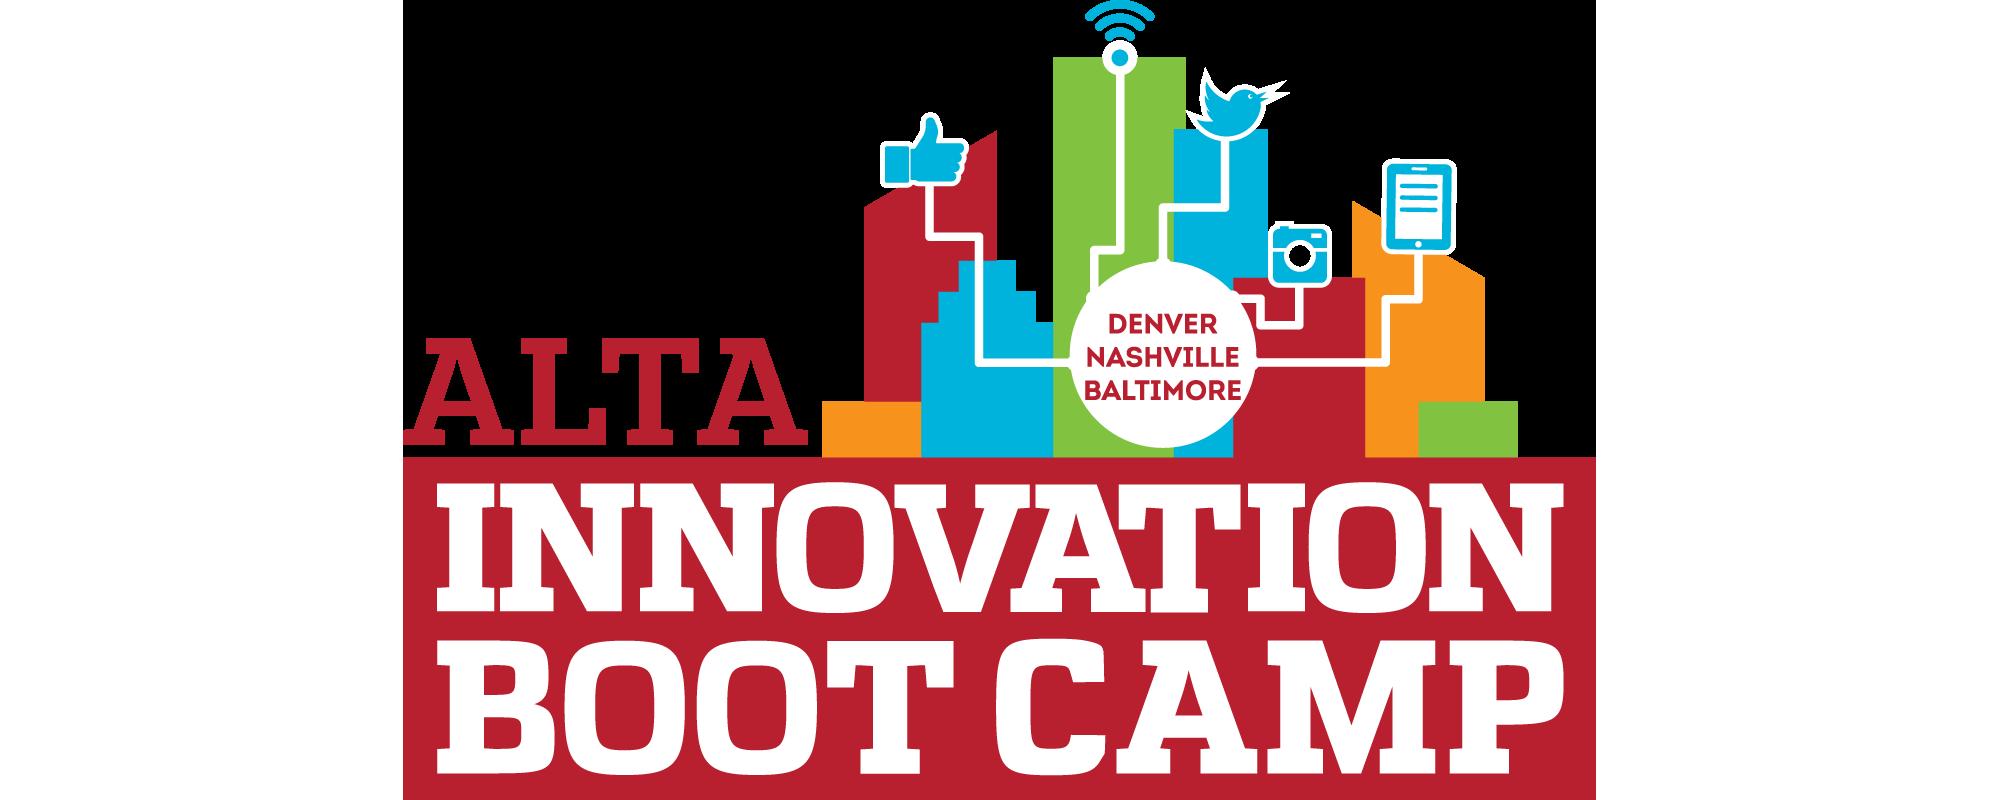 ALTA Innovation Bootcamp